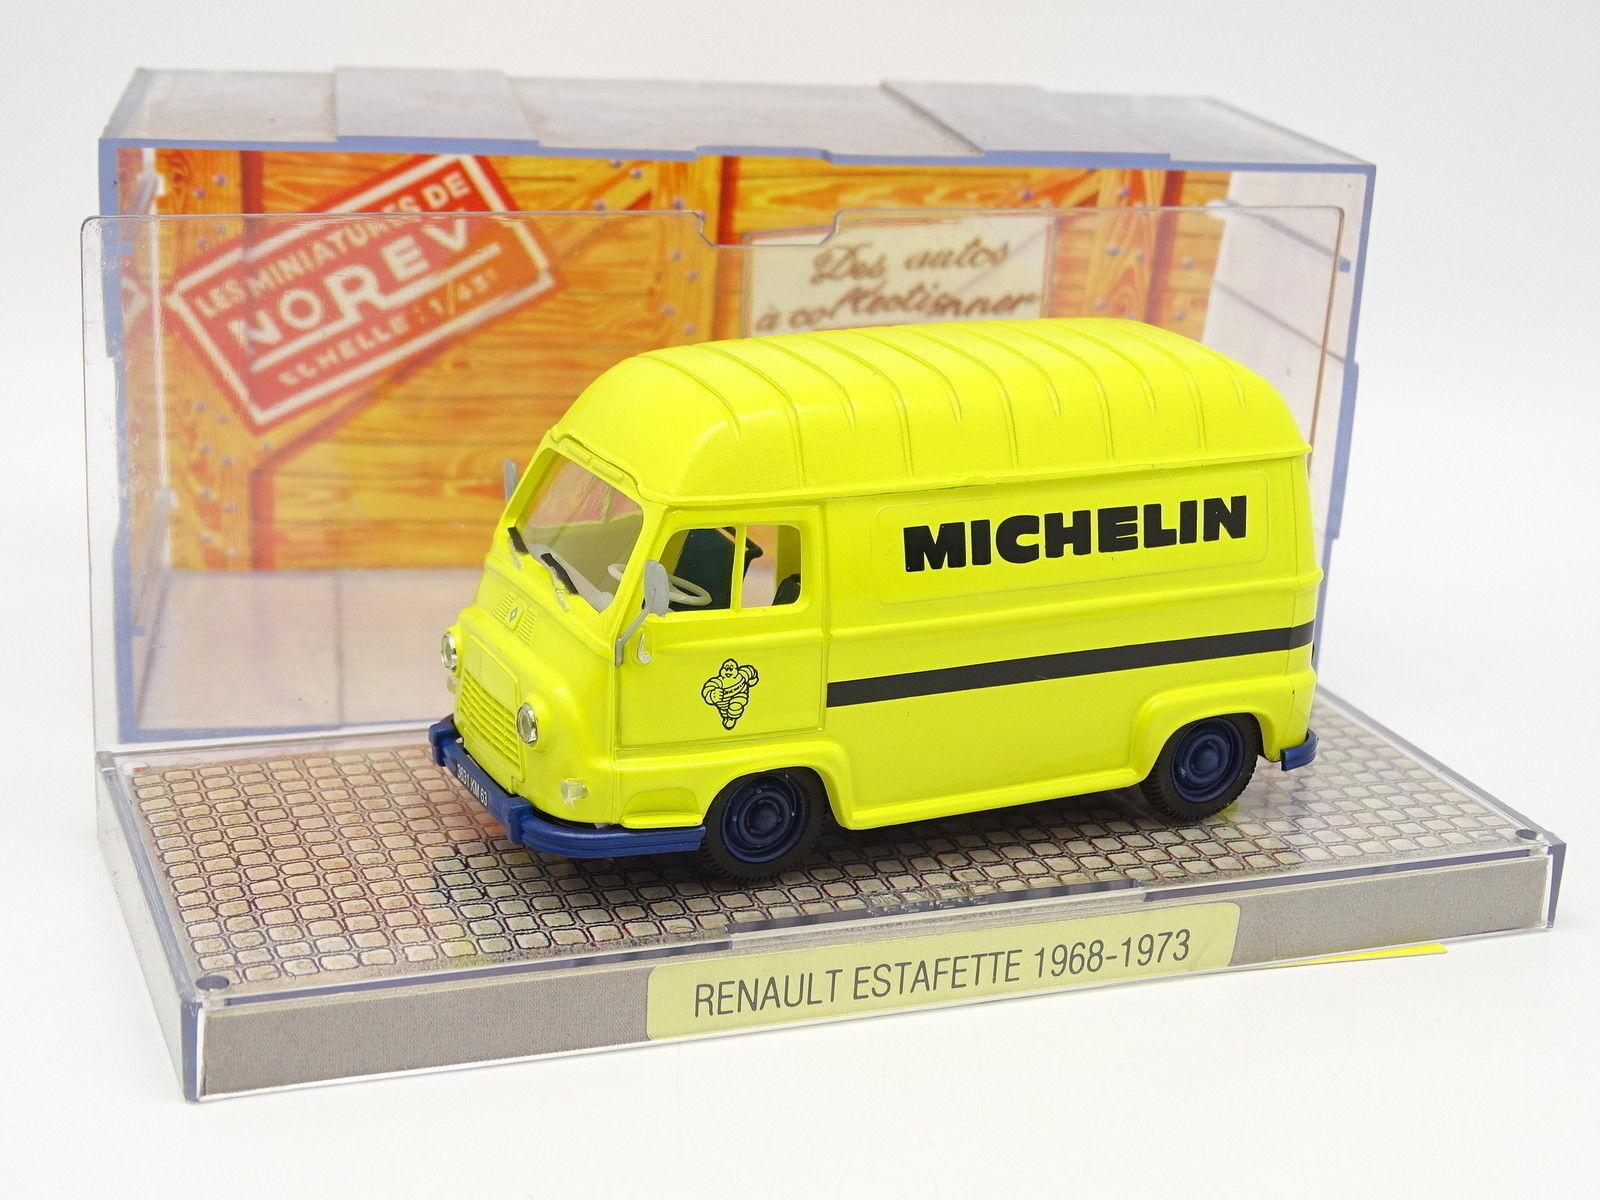 Norev 1 43 - Renault Estafette Michelin